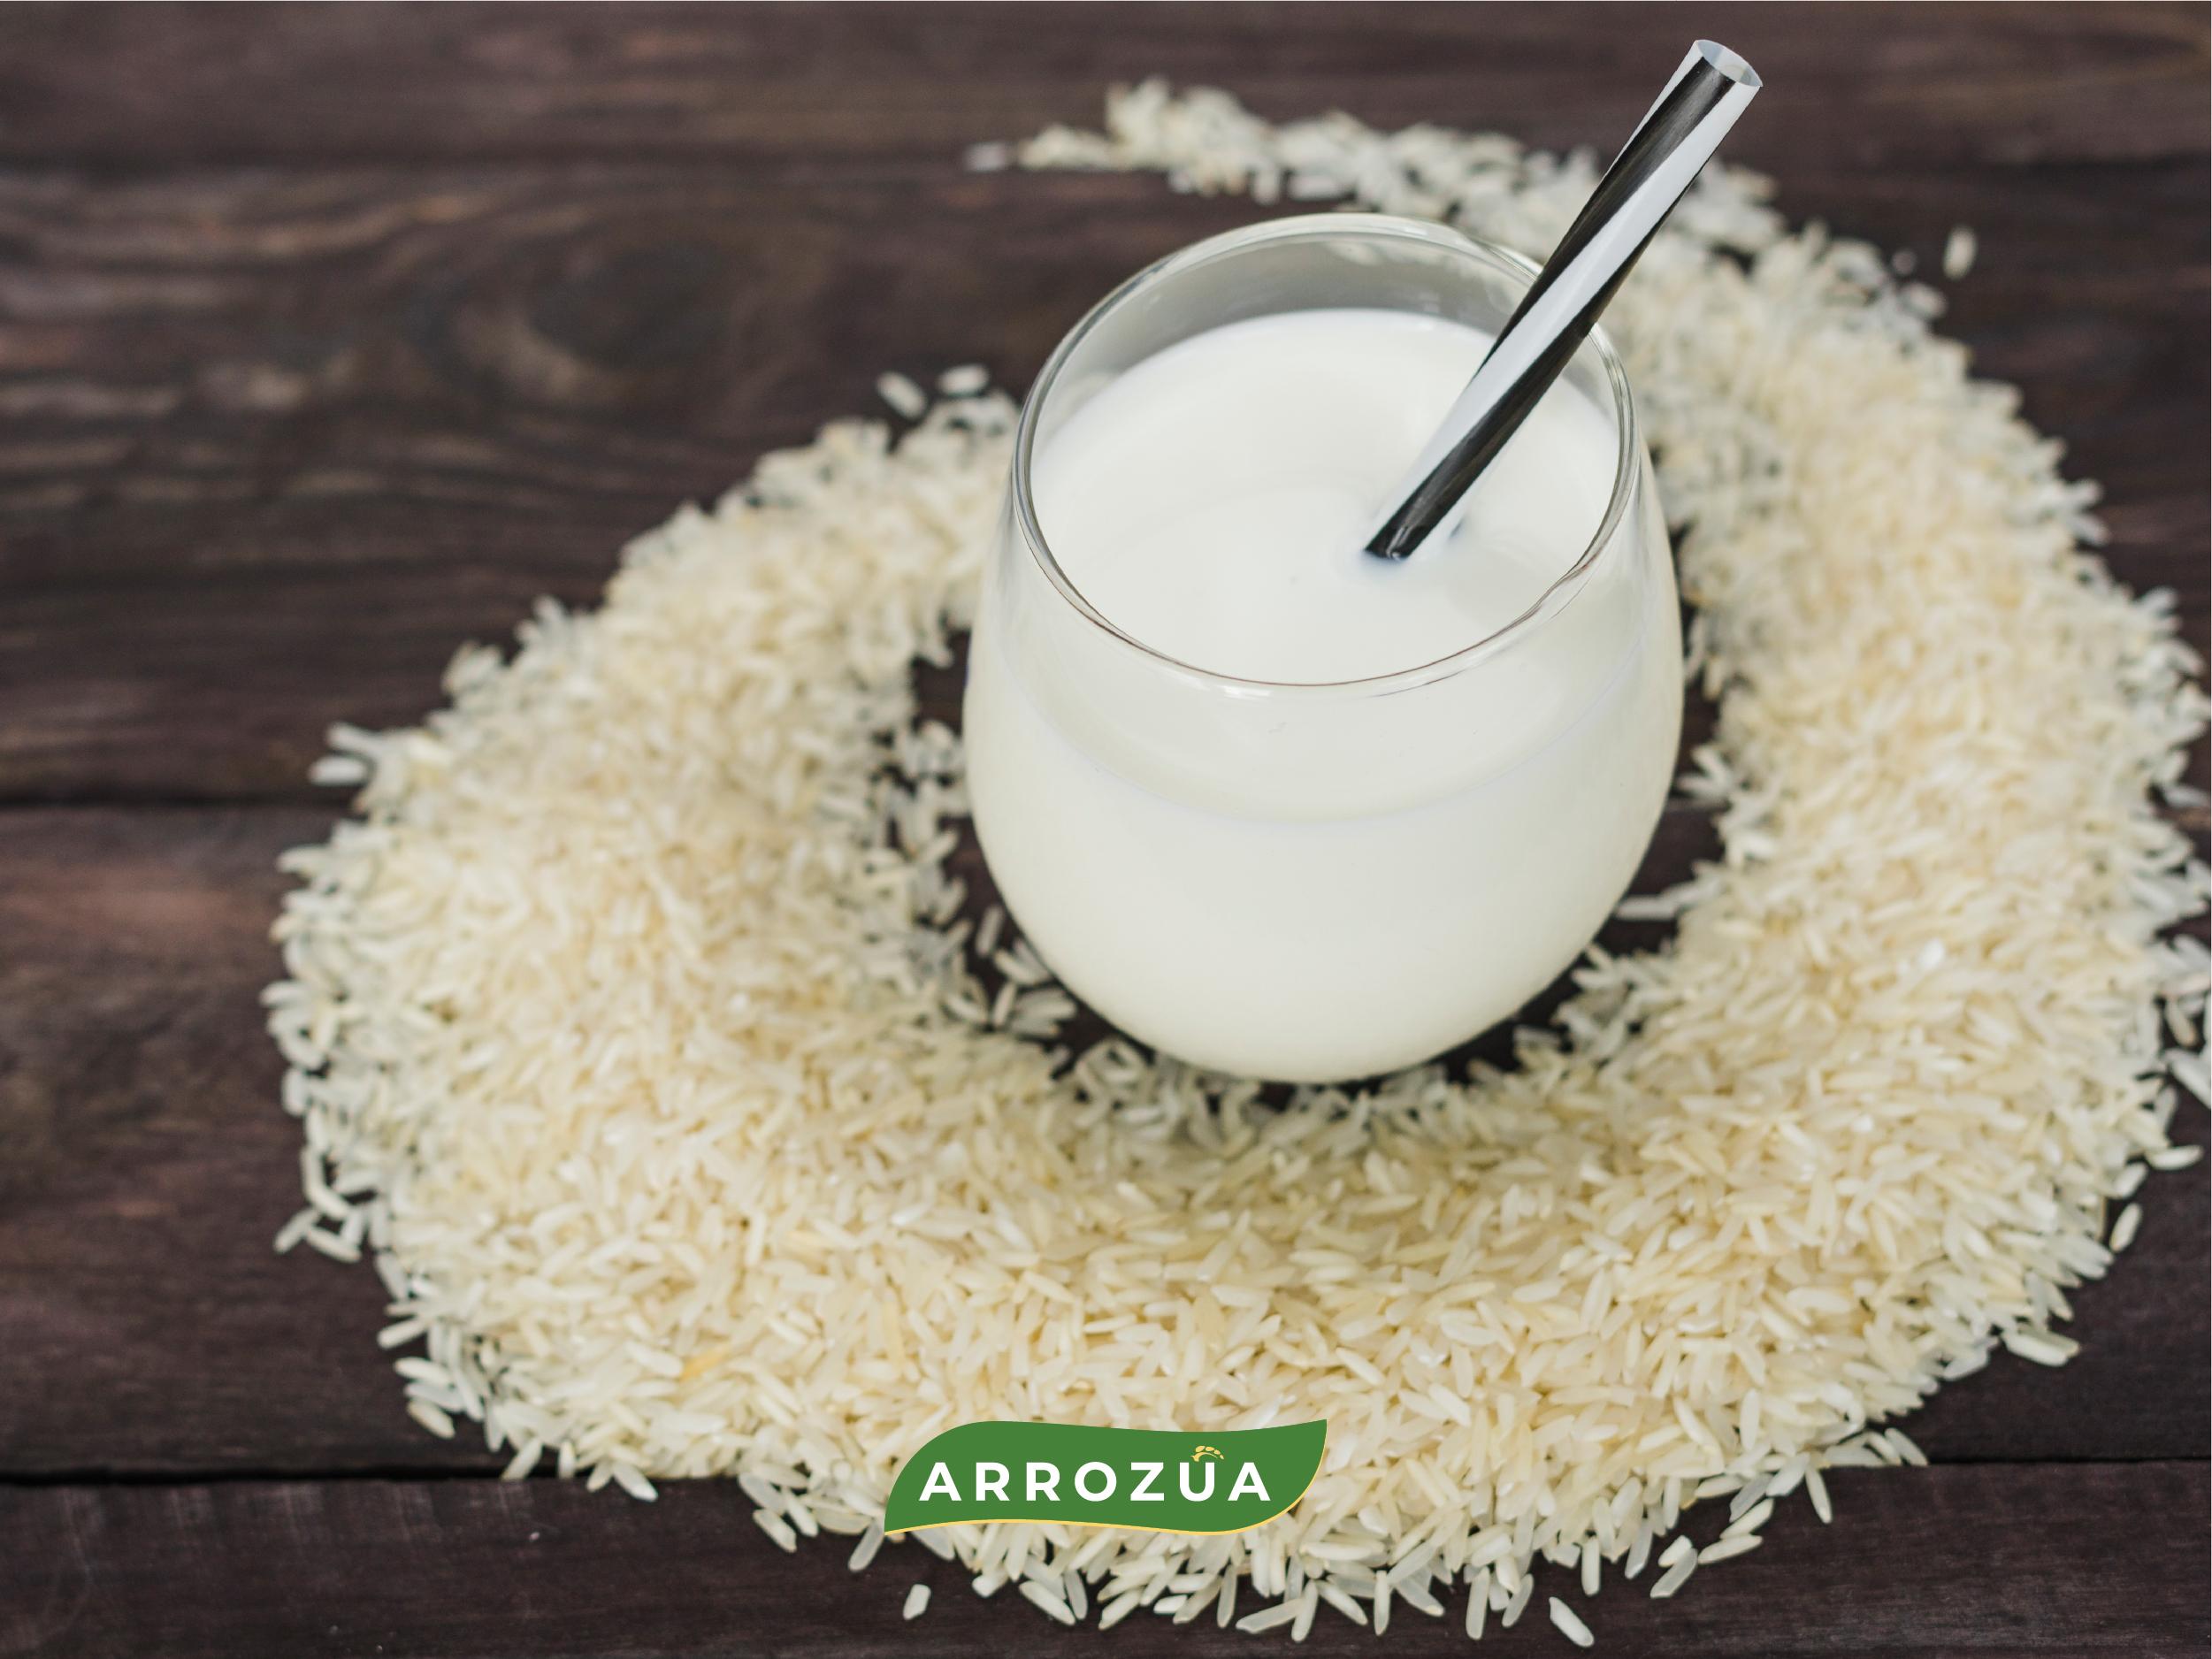 Haz tu propia leche de arroz en casa